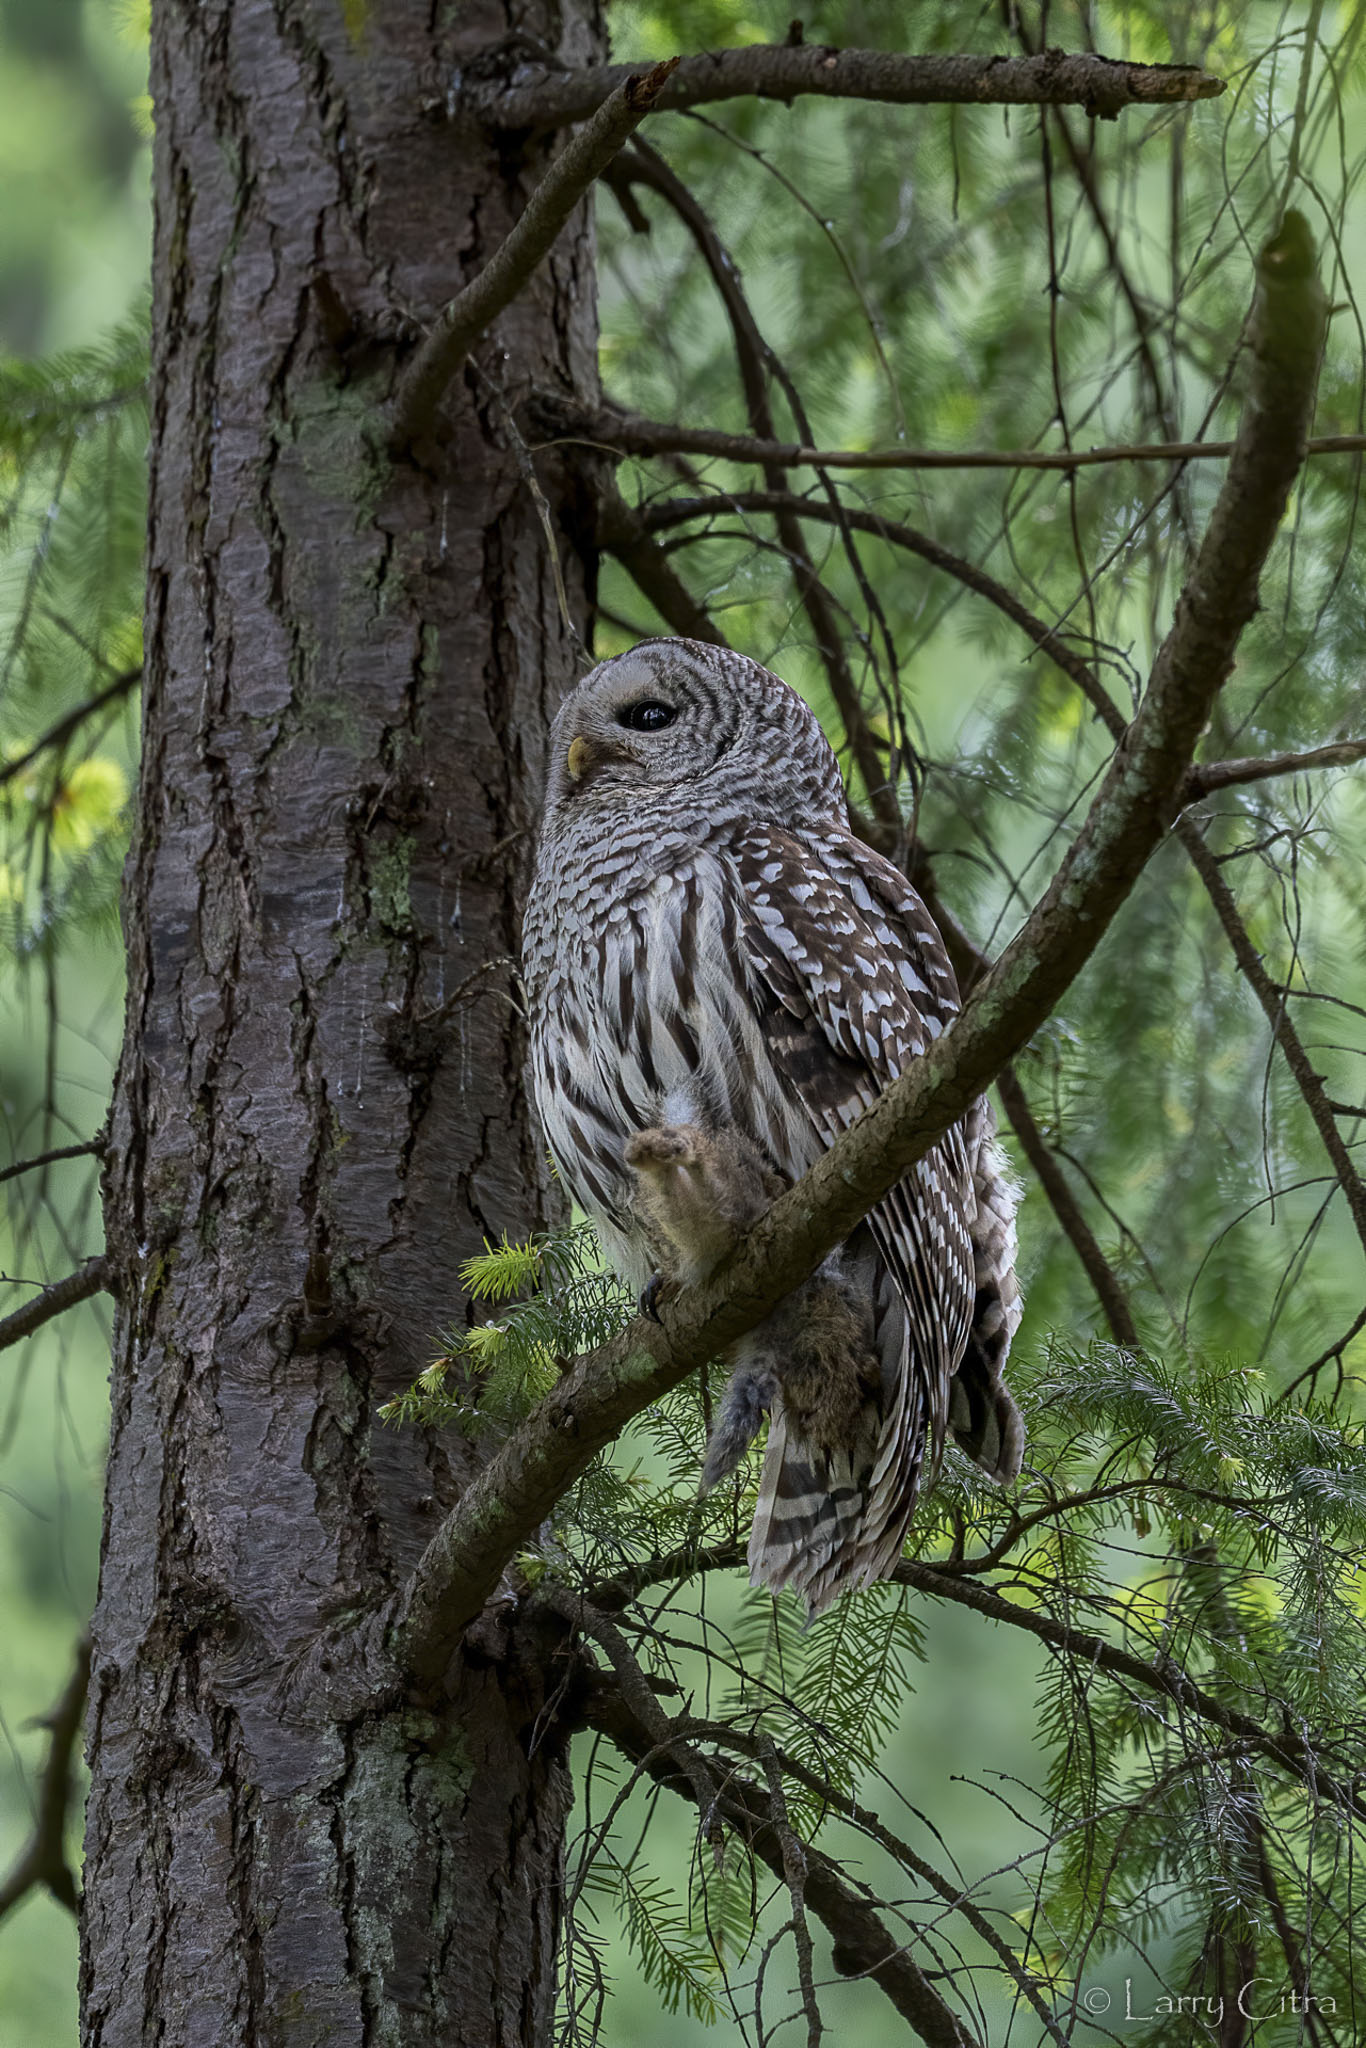 Adult Barred Owl © Larry Citra